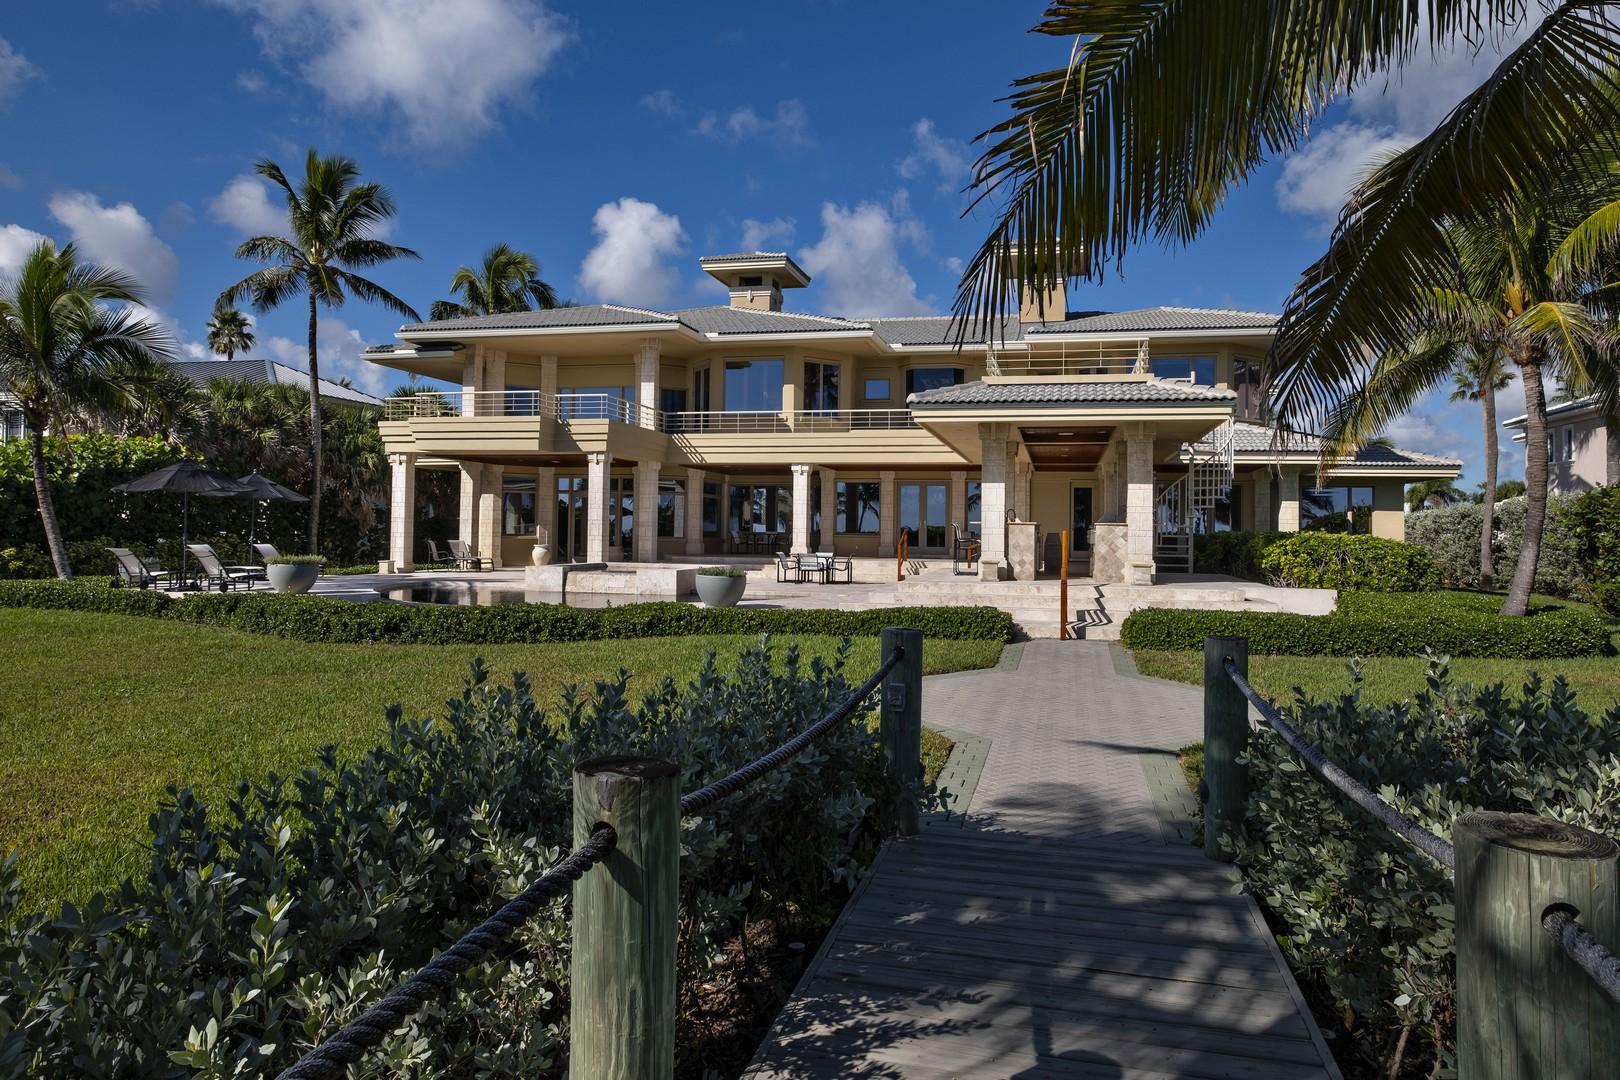 STUART FLORIDA